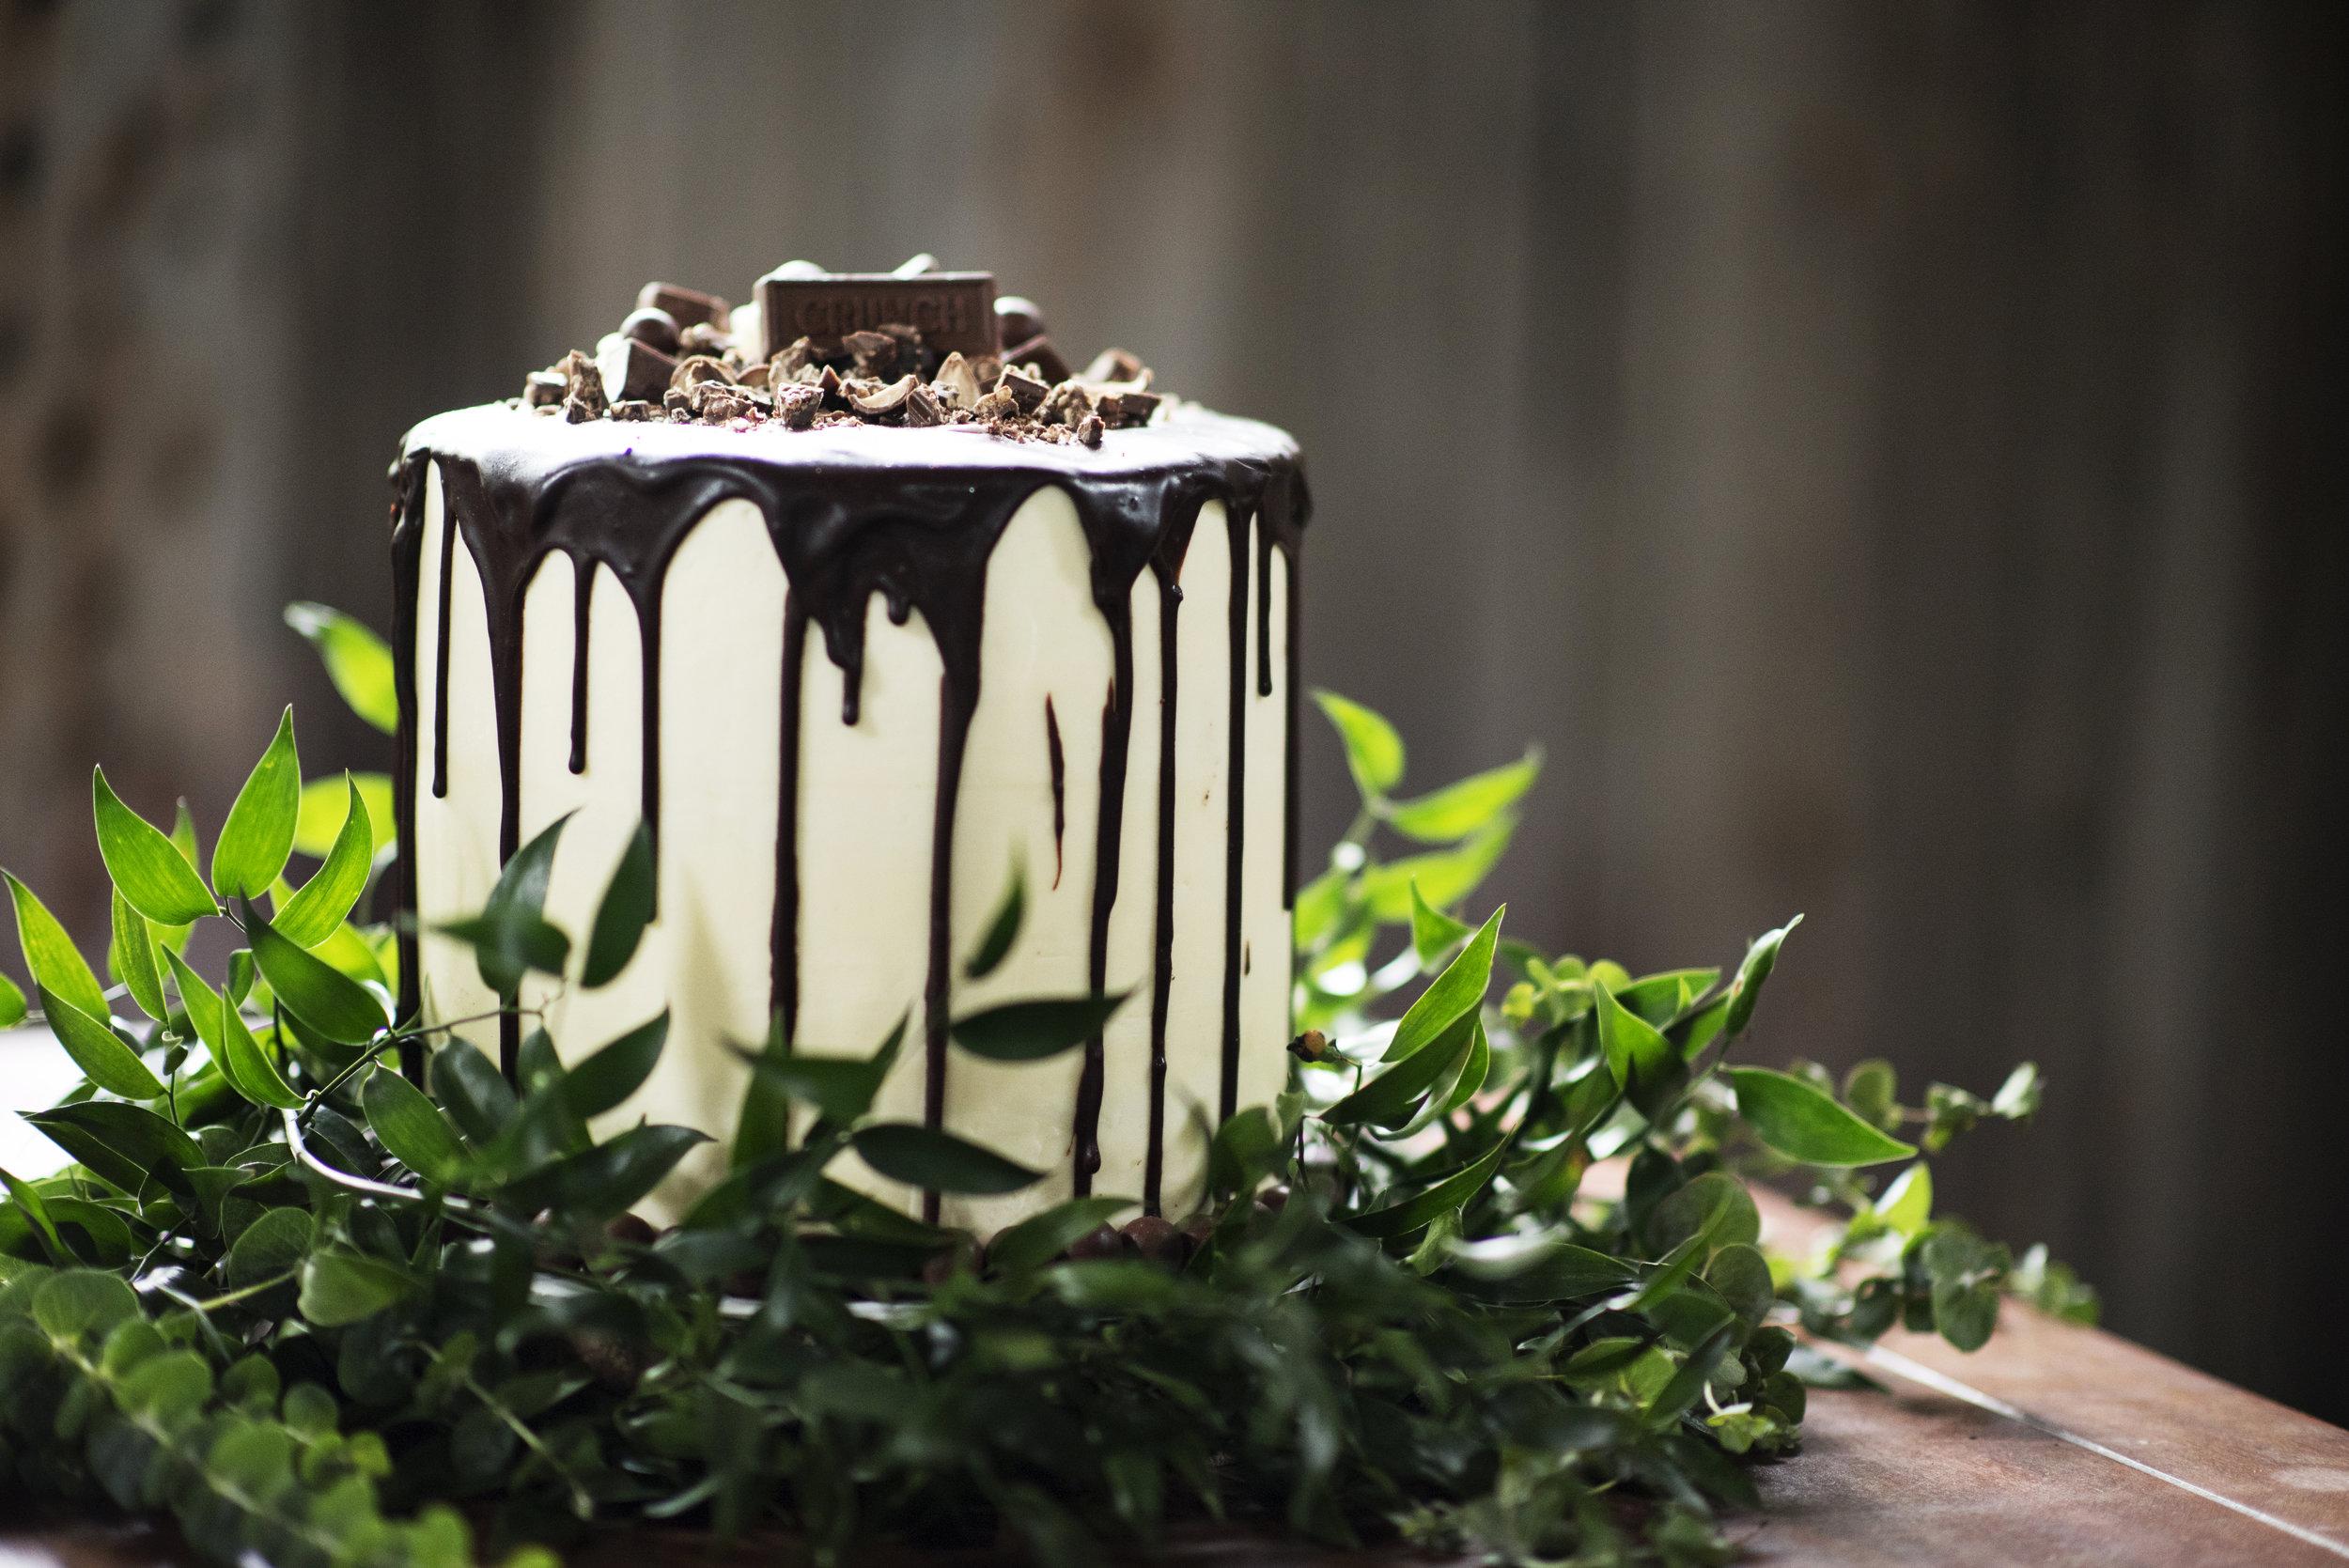 Calvin-wedding-chandelier-grove-tomball-tx-ashleigh-rodriguez-photography-60.jpg